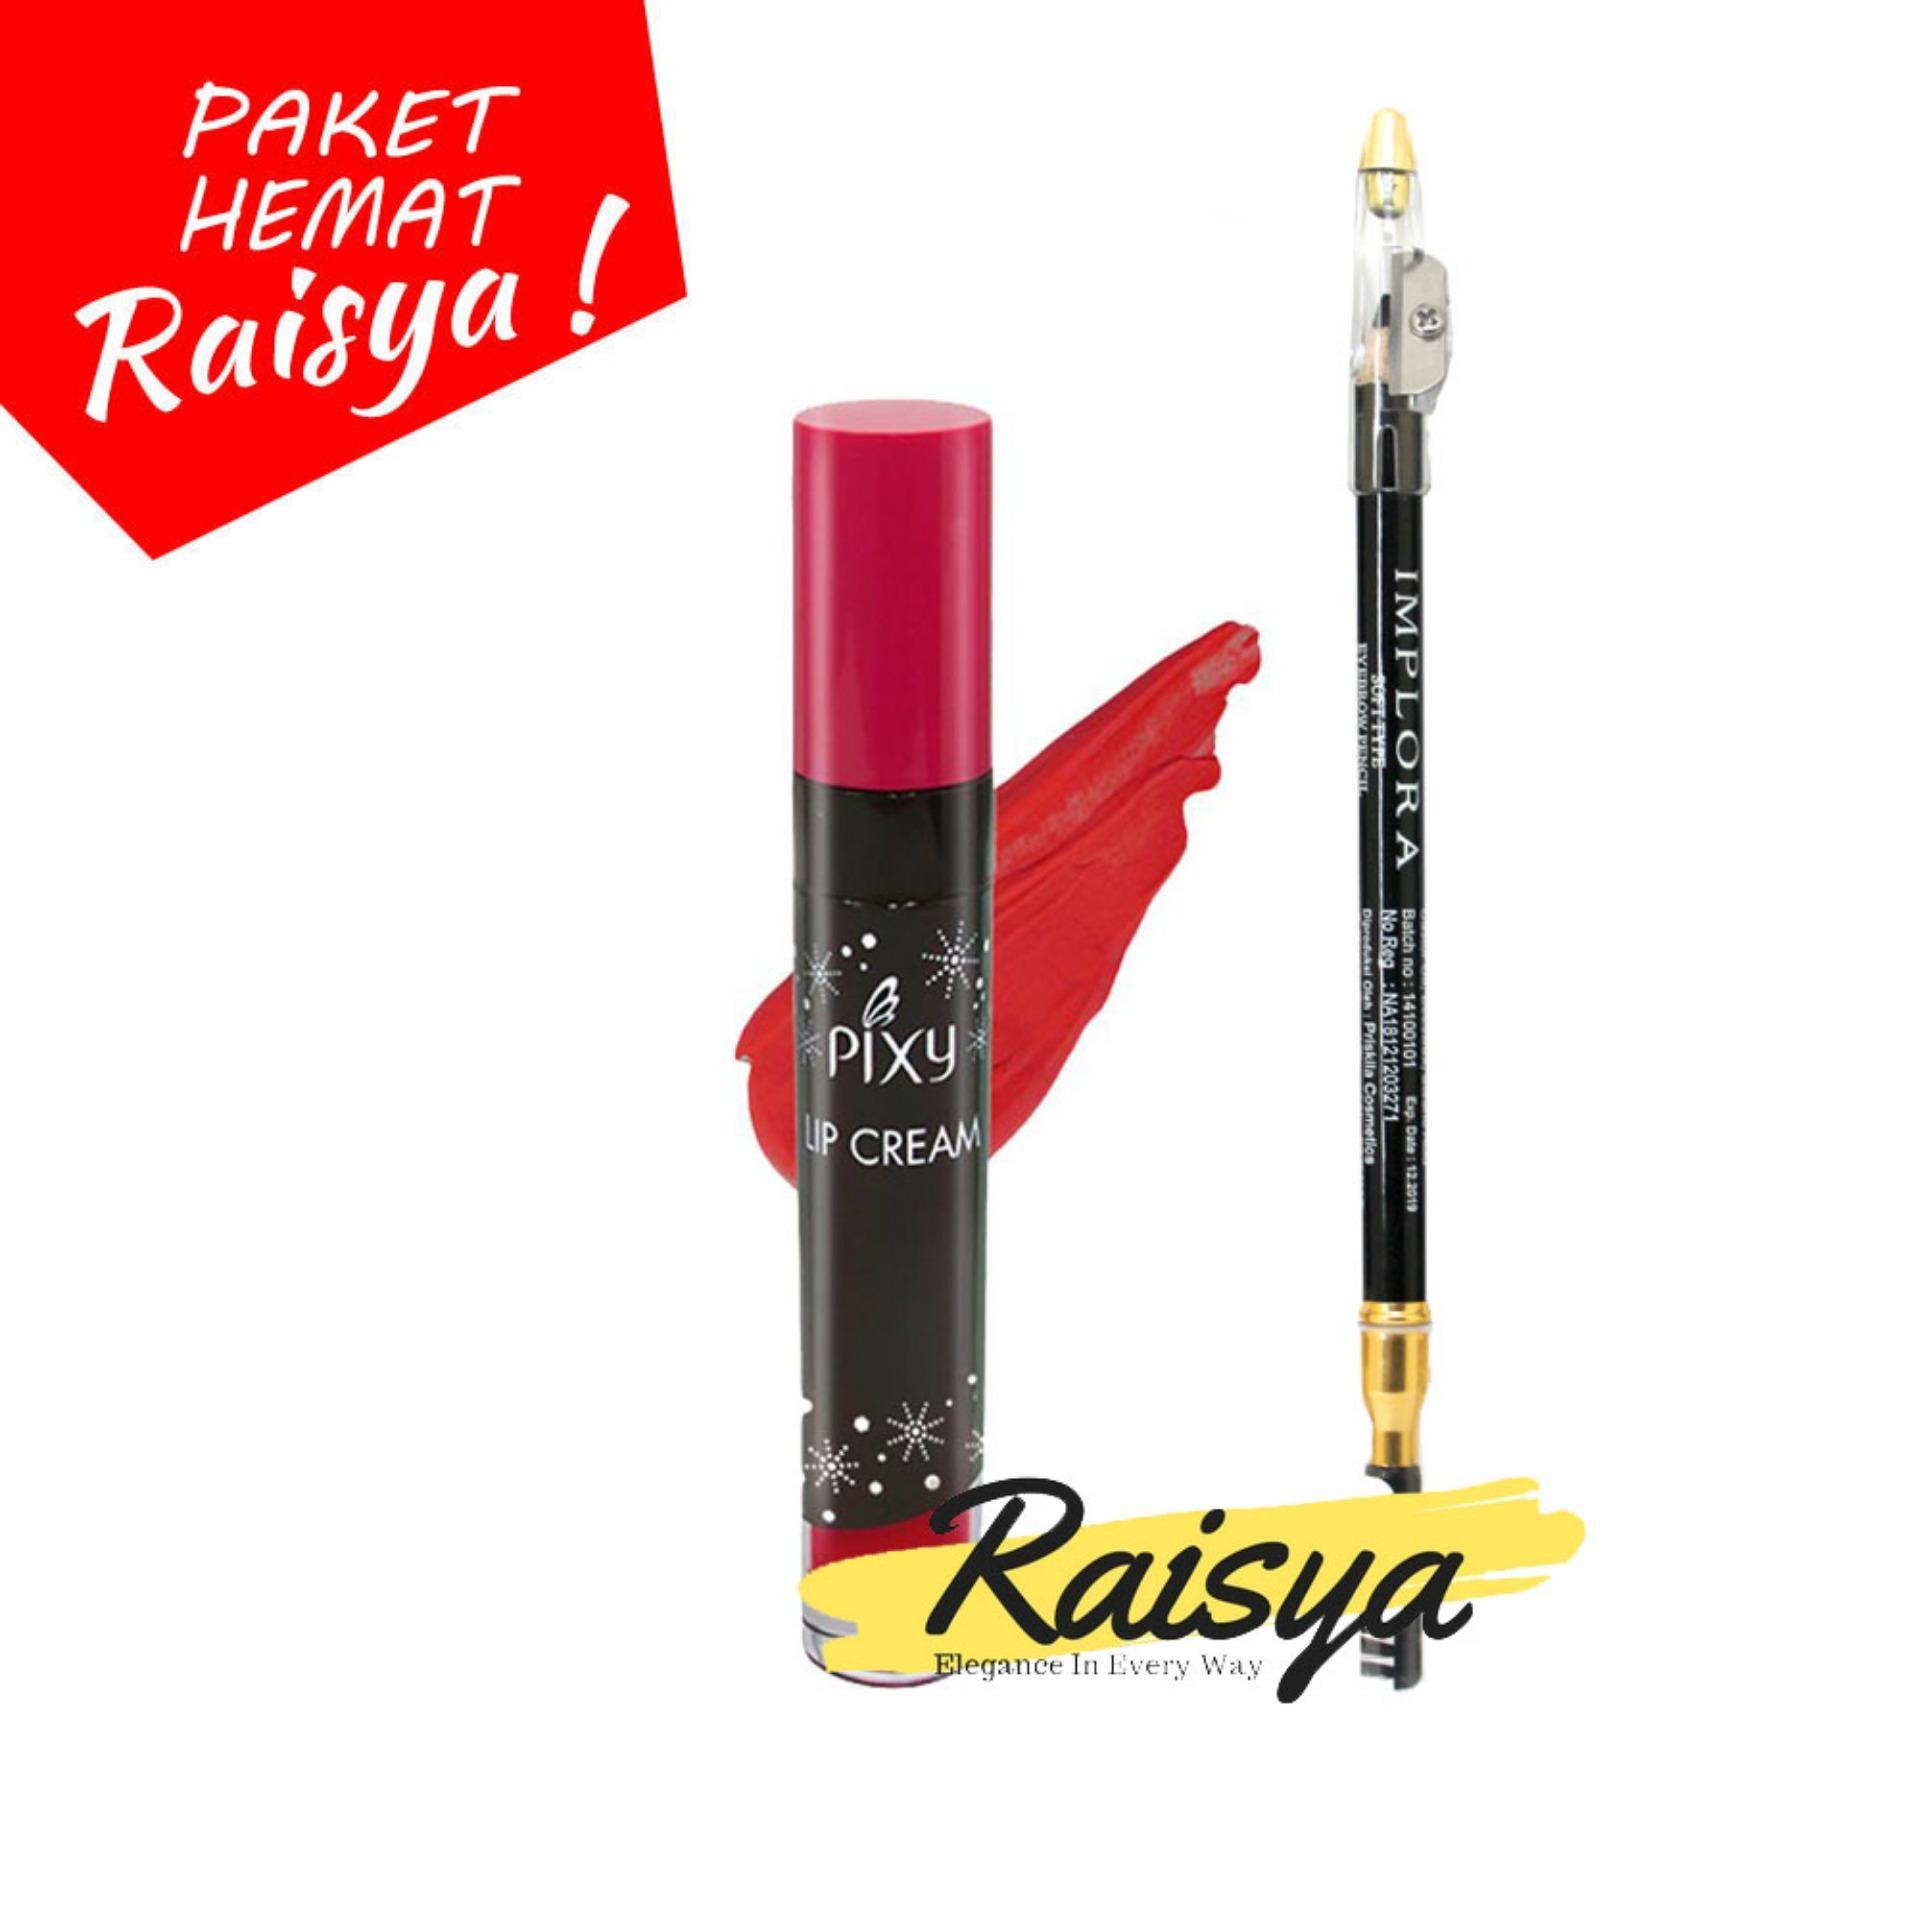 Pixy Lip Cream No. 02 Party Red Free Implora Pensil Alis Hitam Resmi BPOM